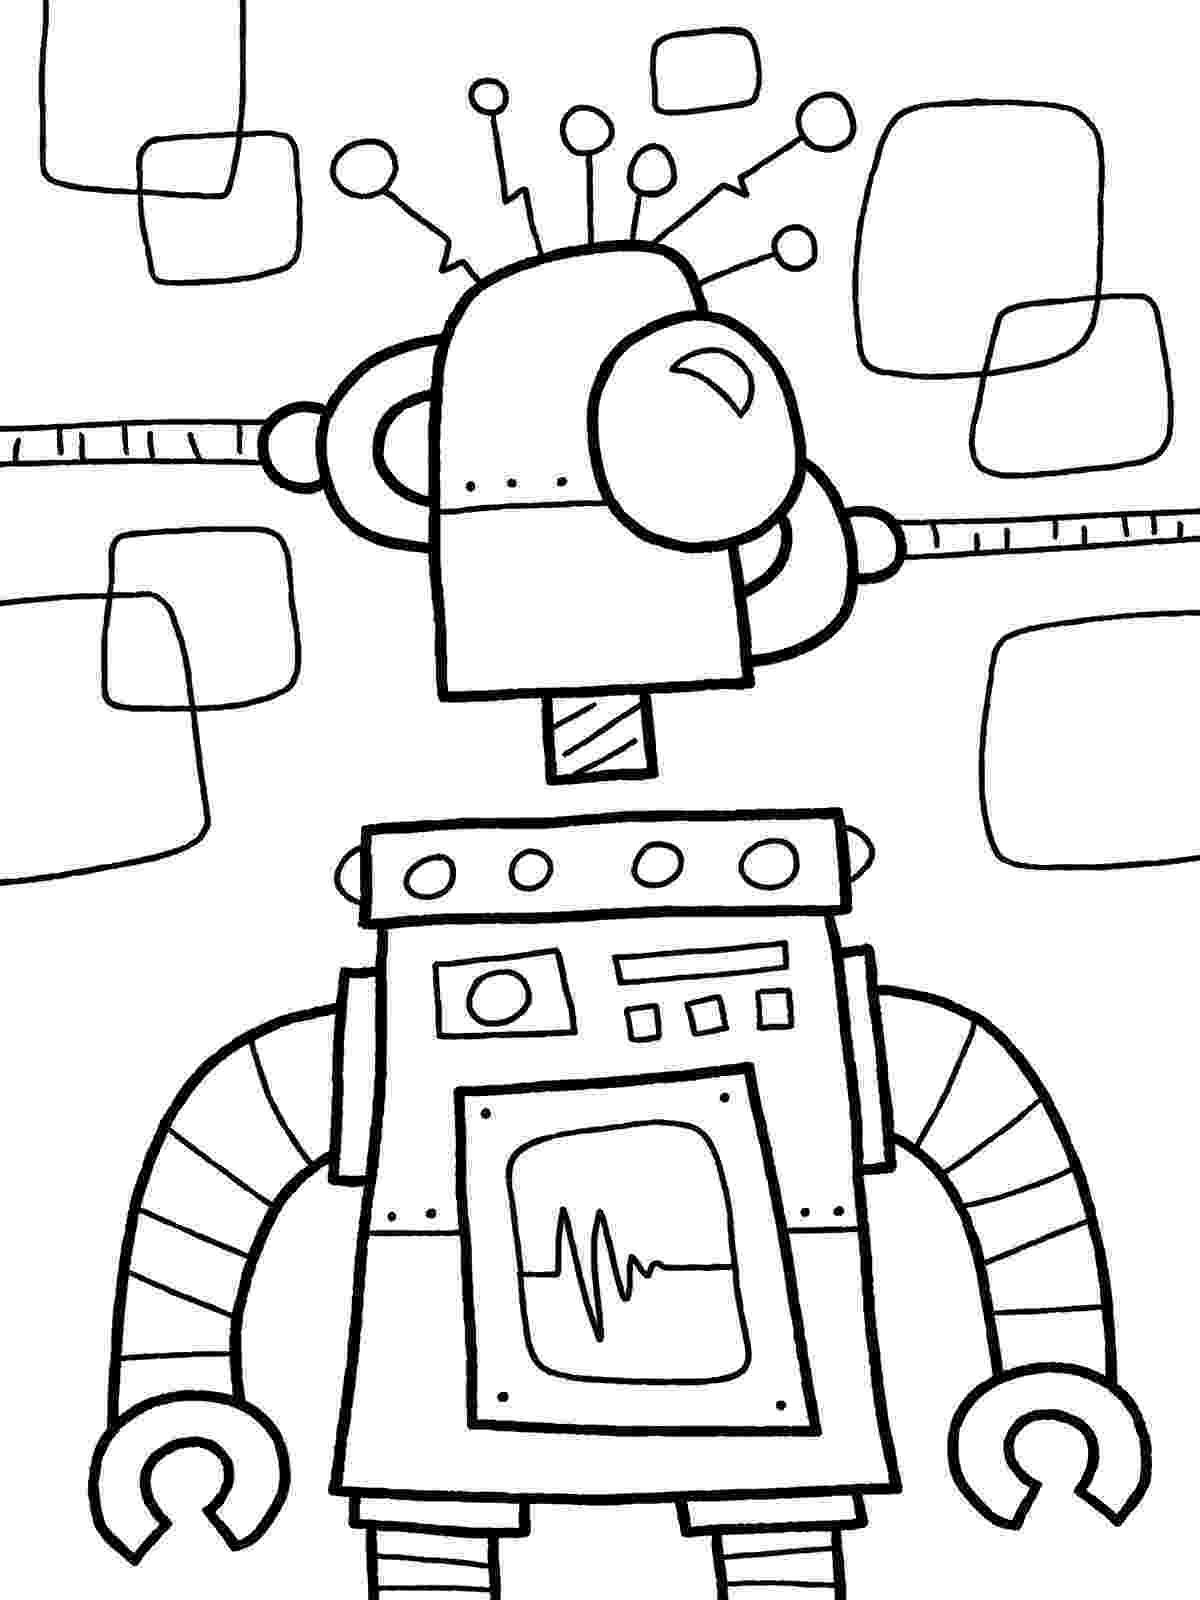 robots coloring pages robots coloring pages download and print robots coloring pages robots coloring